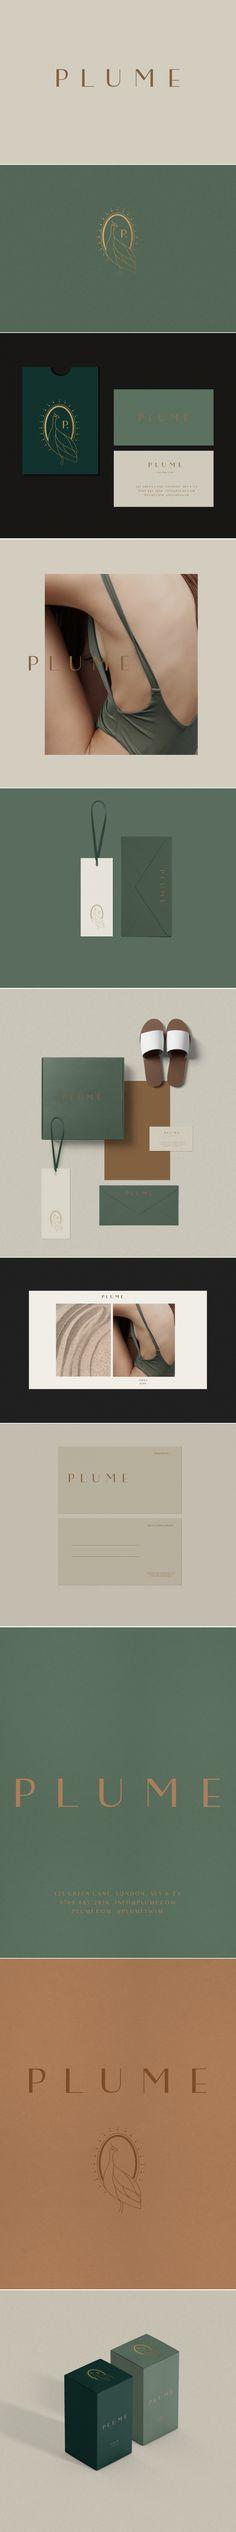 Plume swimwear logo design and brand design by Loolaa Designs Web Design, Fashion Logo Design, Icon Design, Graphic Design, Brand Identity Design, Design Agency, Brand Design, Branding Agency, Logo Branding